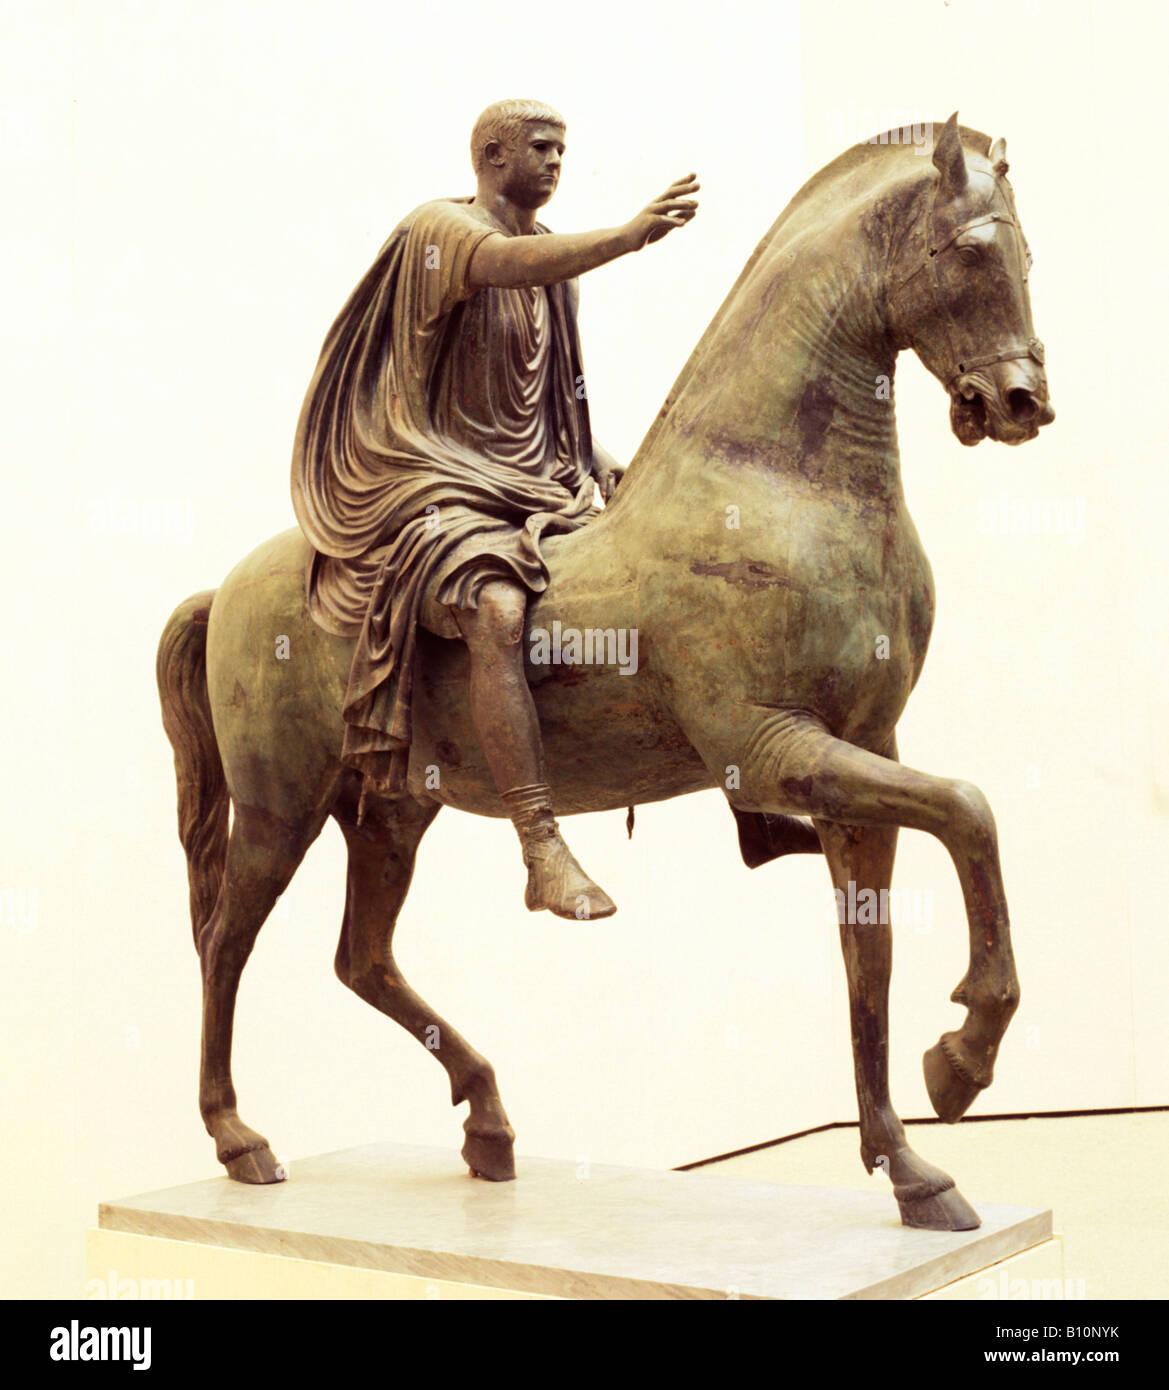 Caligula bronze equestrian statue 1st c Pompeii Italy - Stock Image